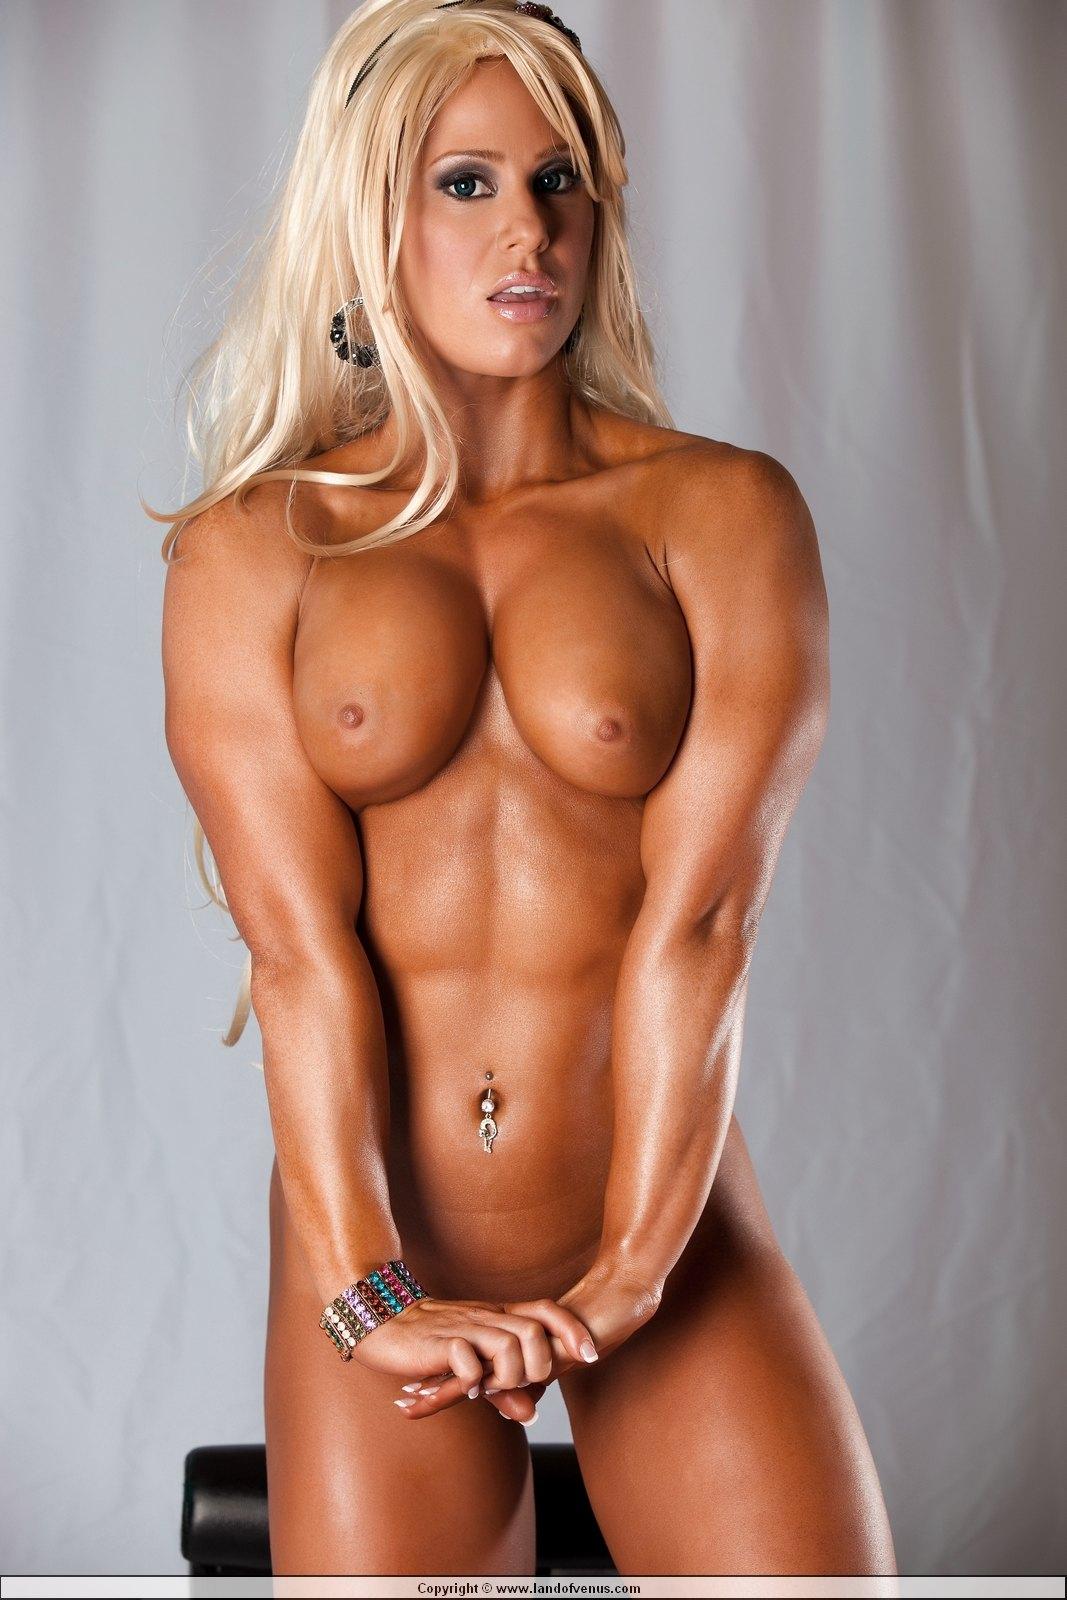 Hot Body Builder